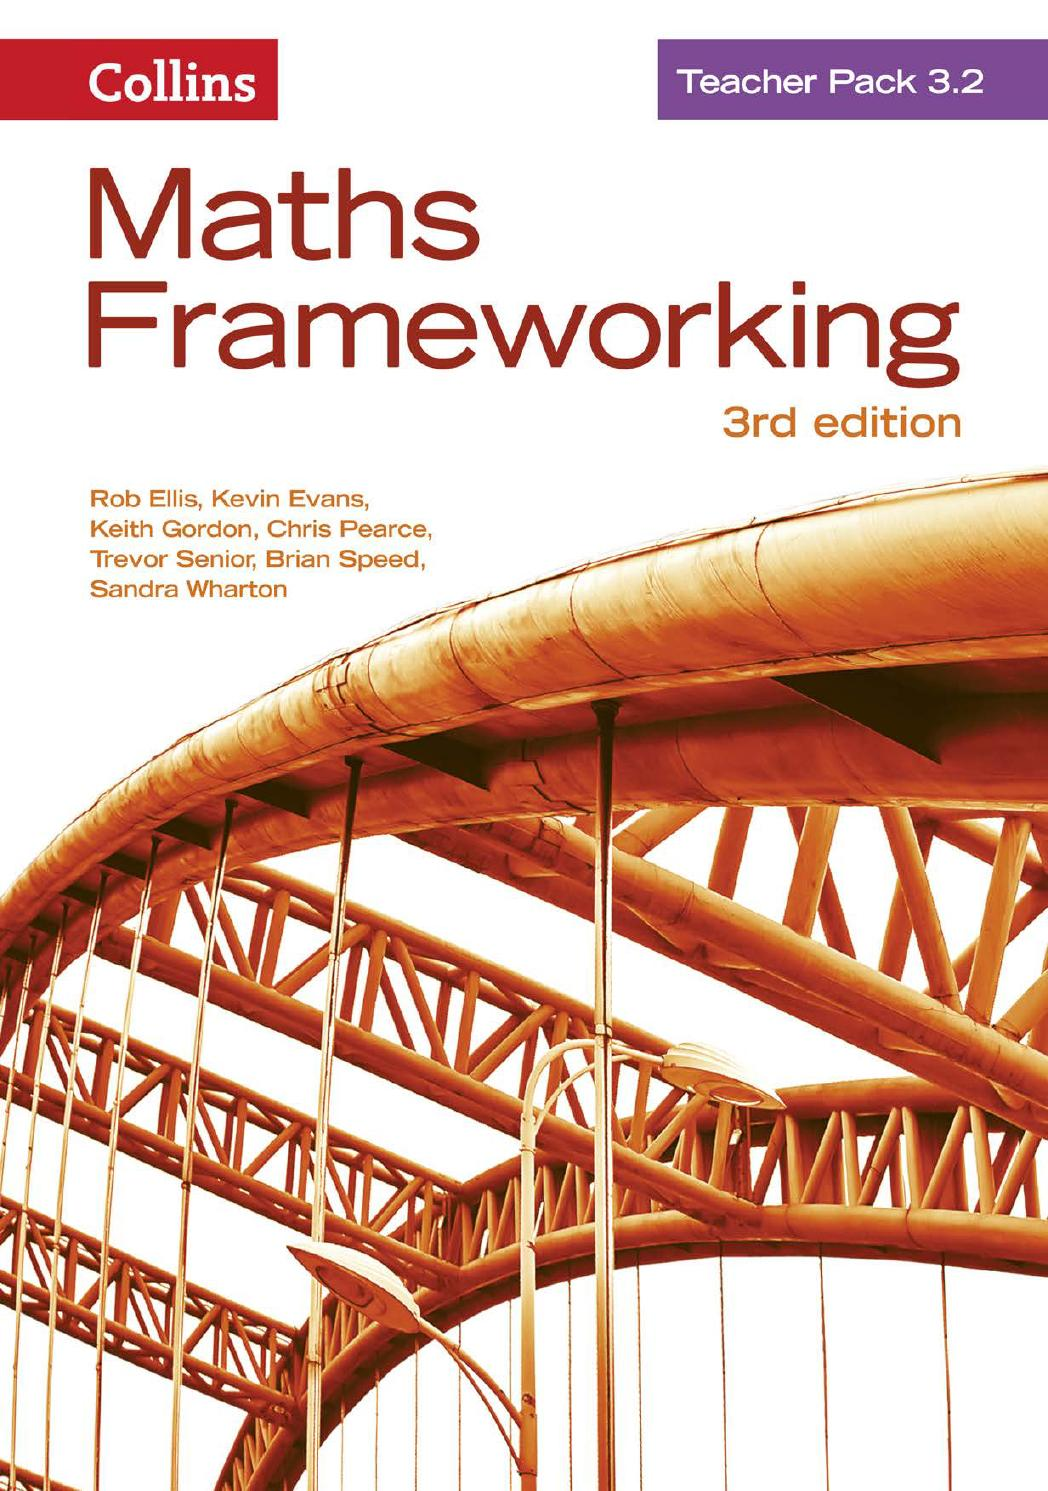 Maths Frameworking Teacher Pack 32 by Collins Issuu